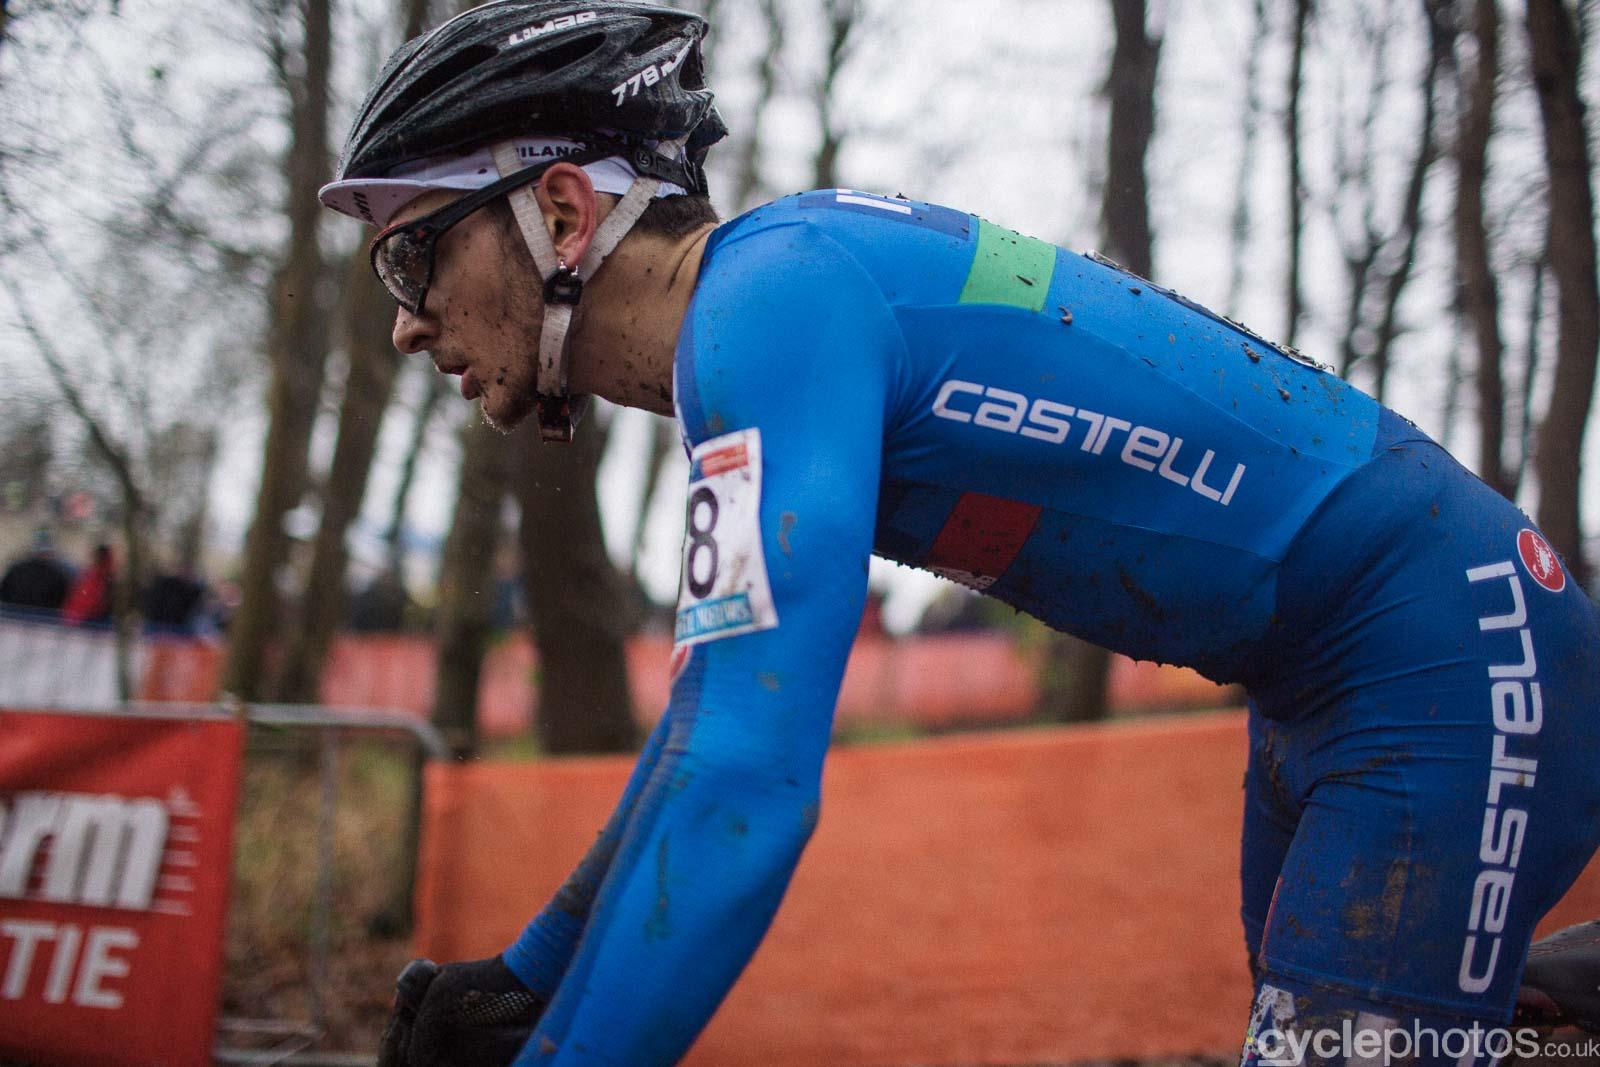 2016-cyclephotos-cyclocross-hoogerheide-115022-gioele-bertolini